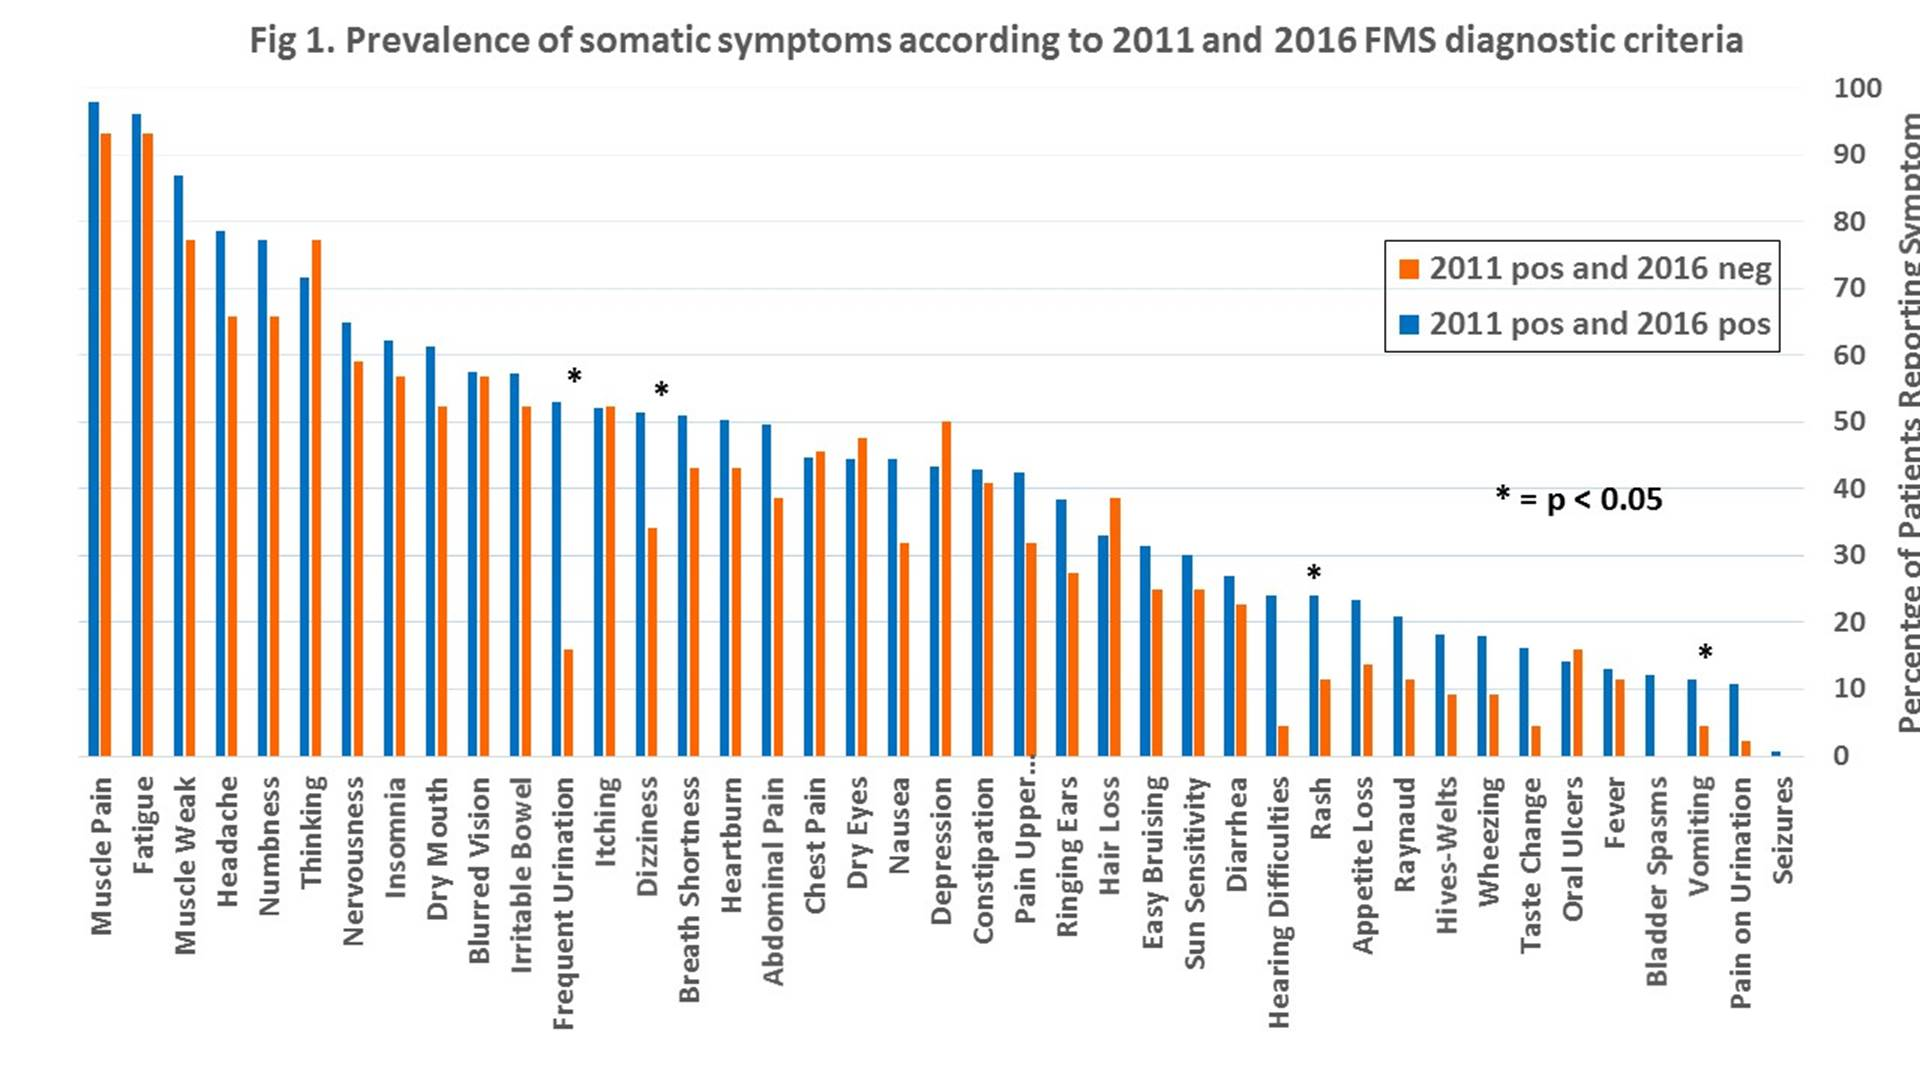 Patients Failing to Fulfill 2016 Criteria for Fibromyalgia